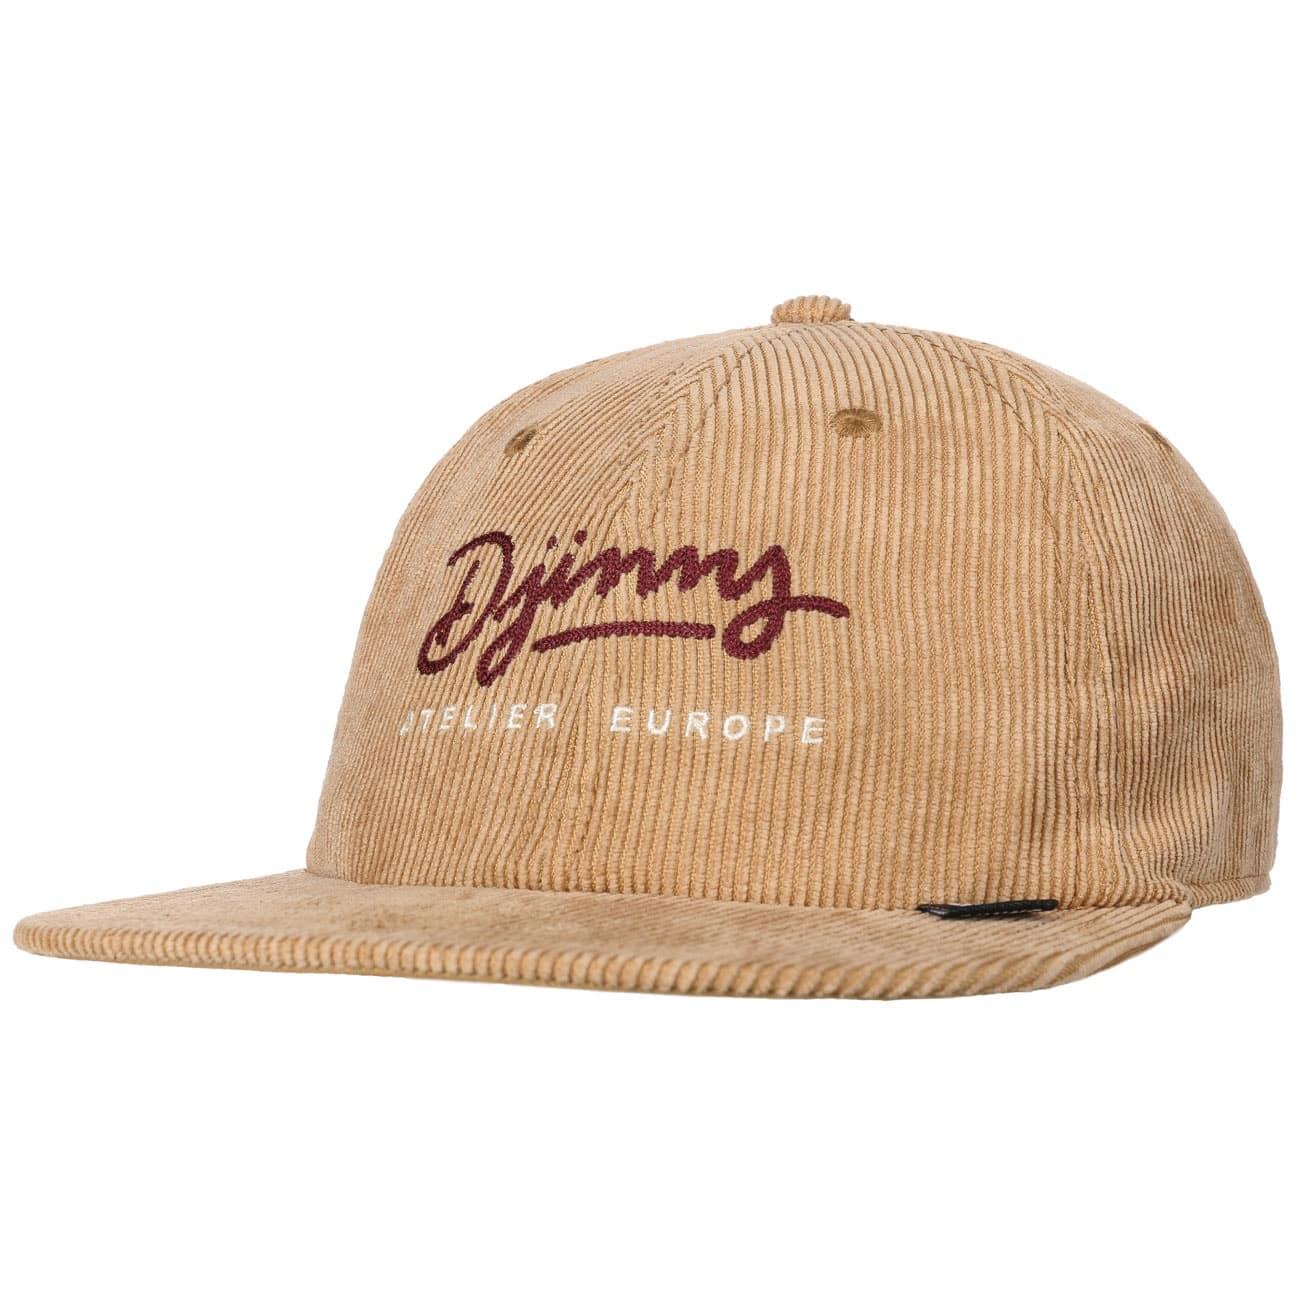 Casquette Strapback 6P LoopCord by Djinns  baseball cap